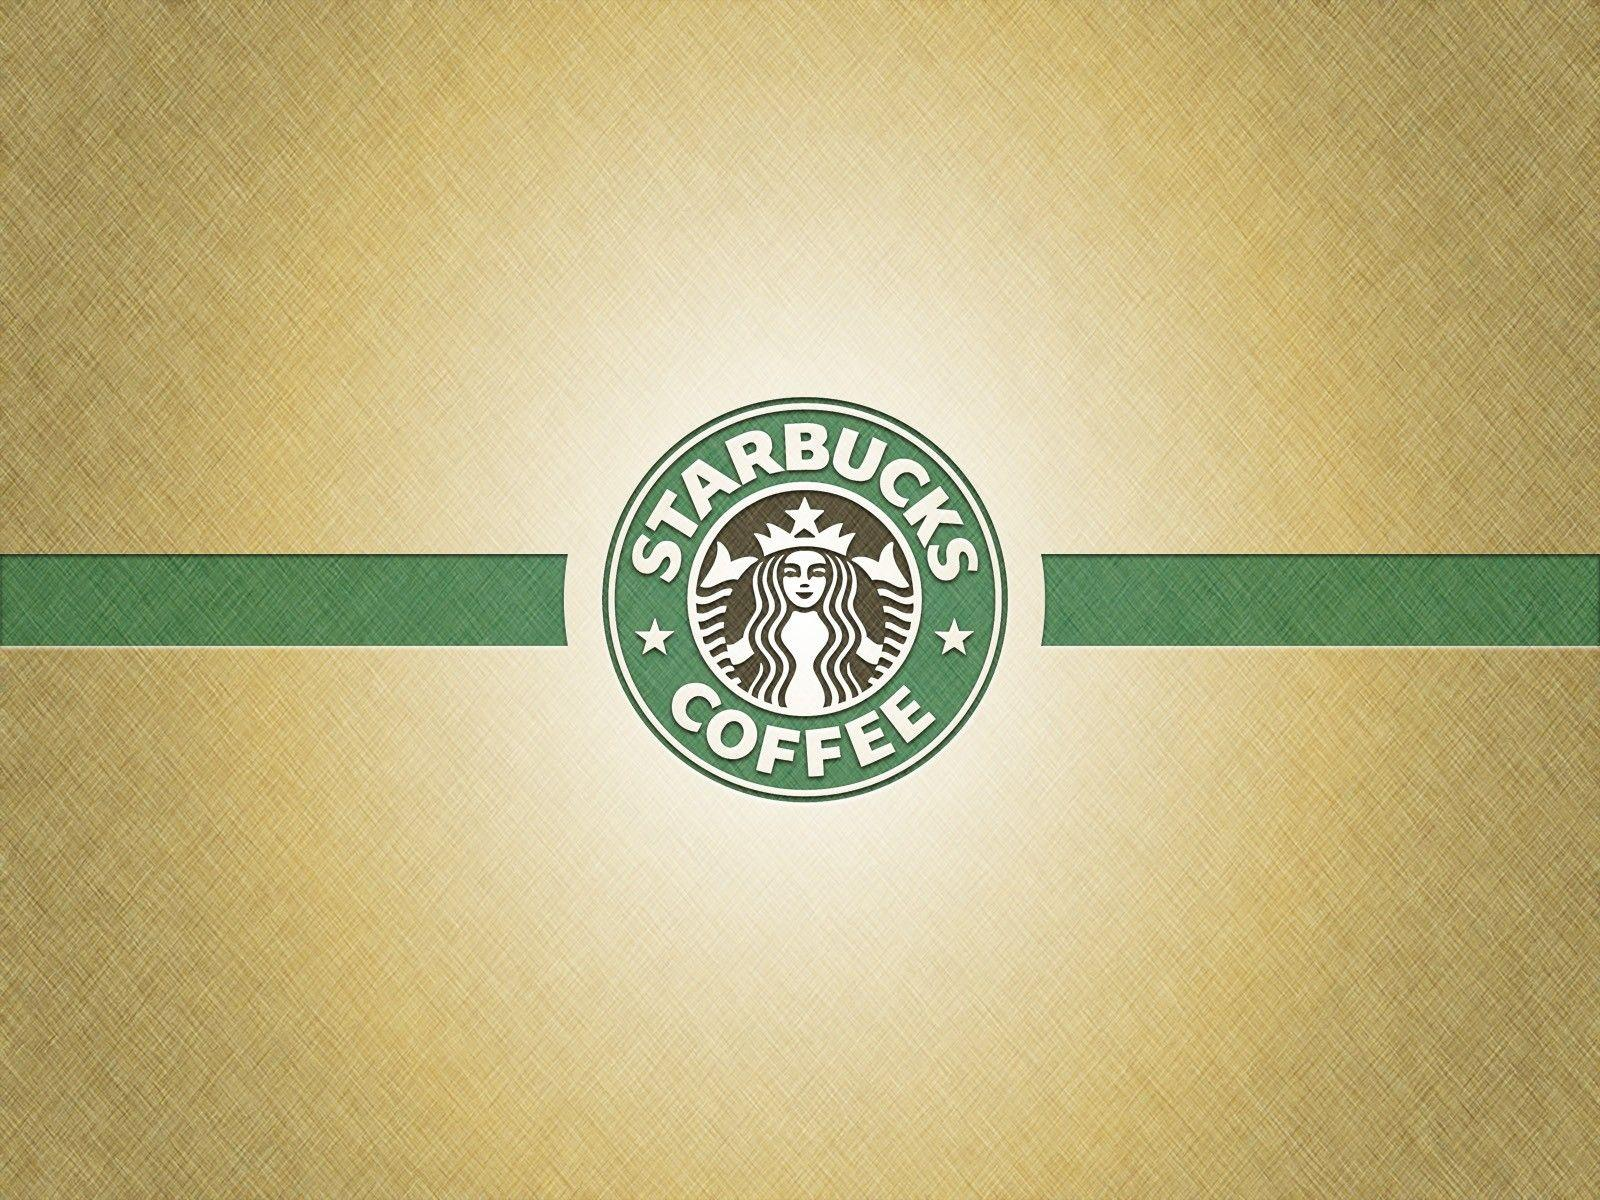 Starbucks Wallpapers - Wallpaper Cave